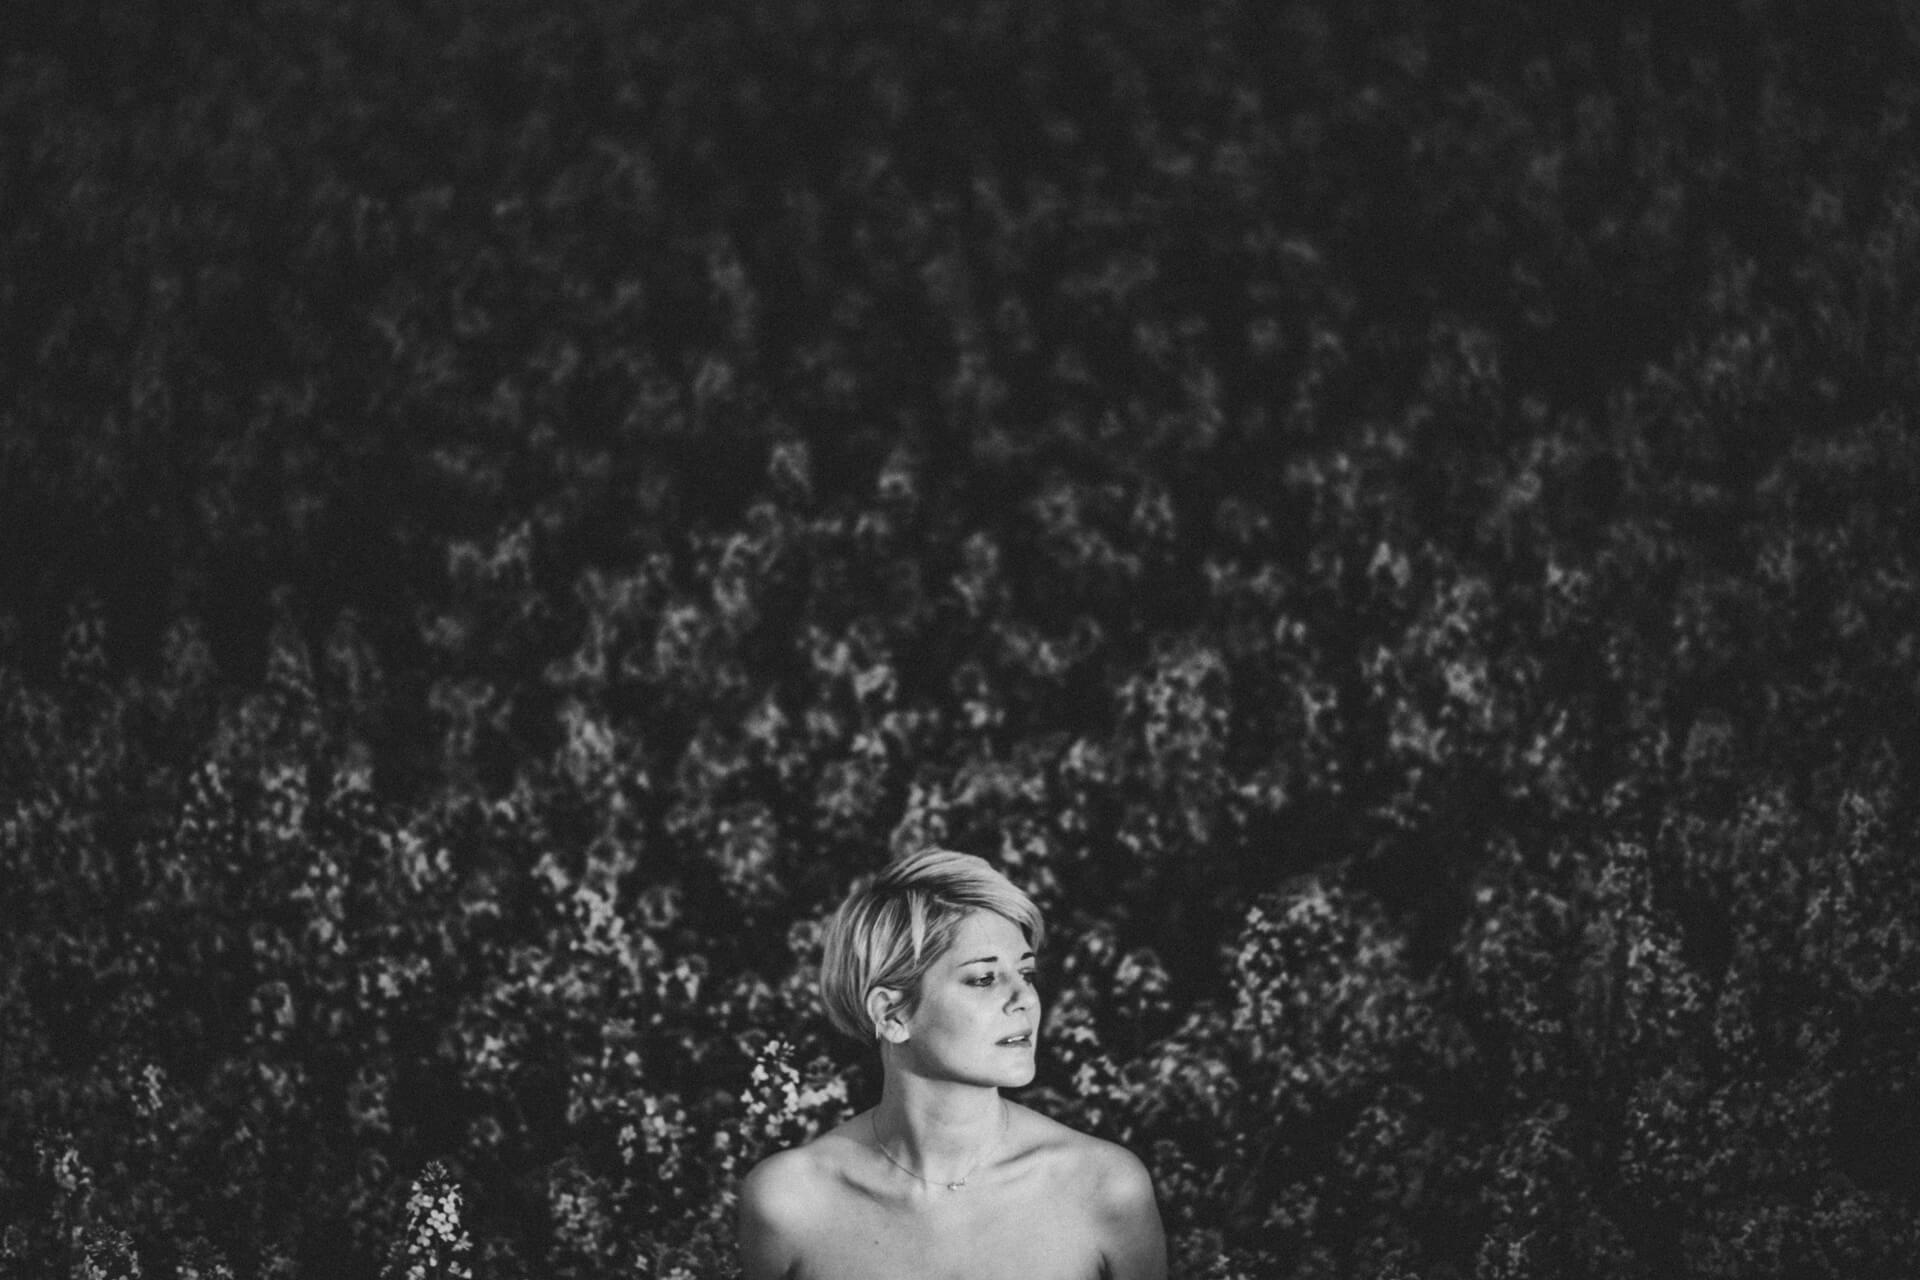 Fotoshooting mit Judith im Rapsfeld - Porträtshooting Marburg - Fotograf Marburg